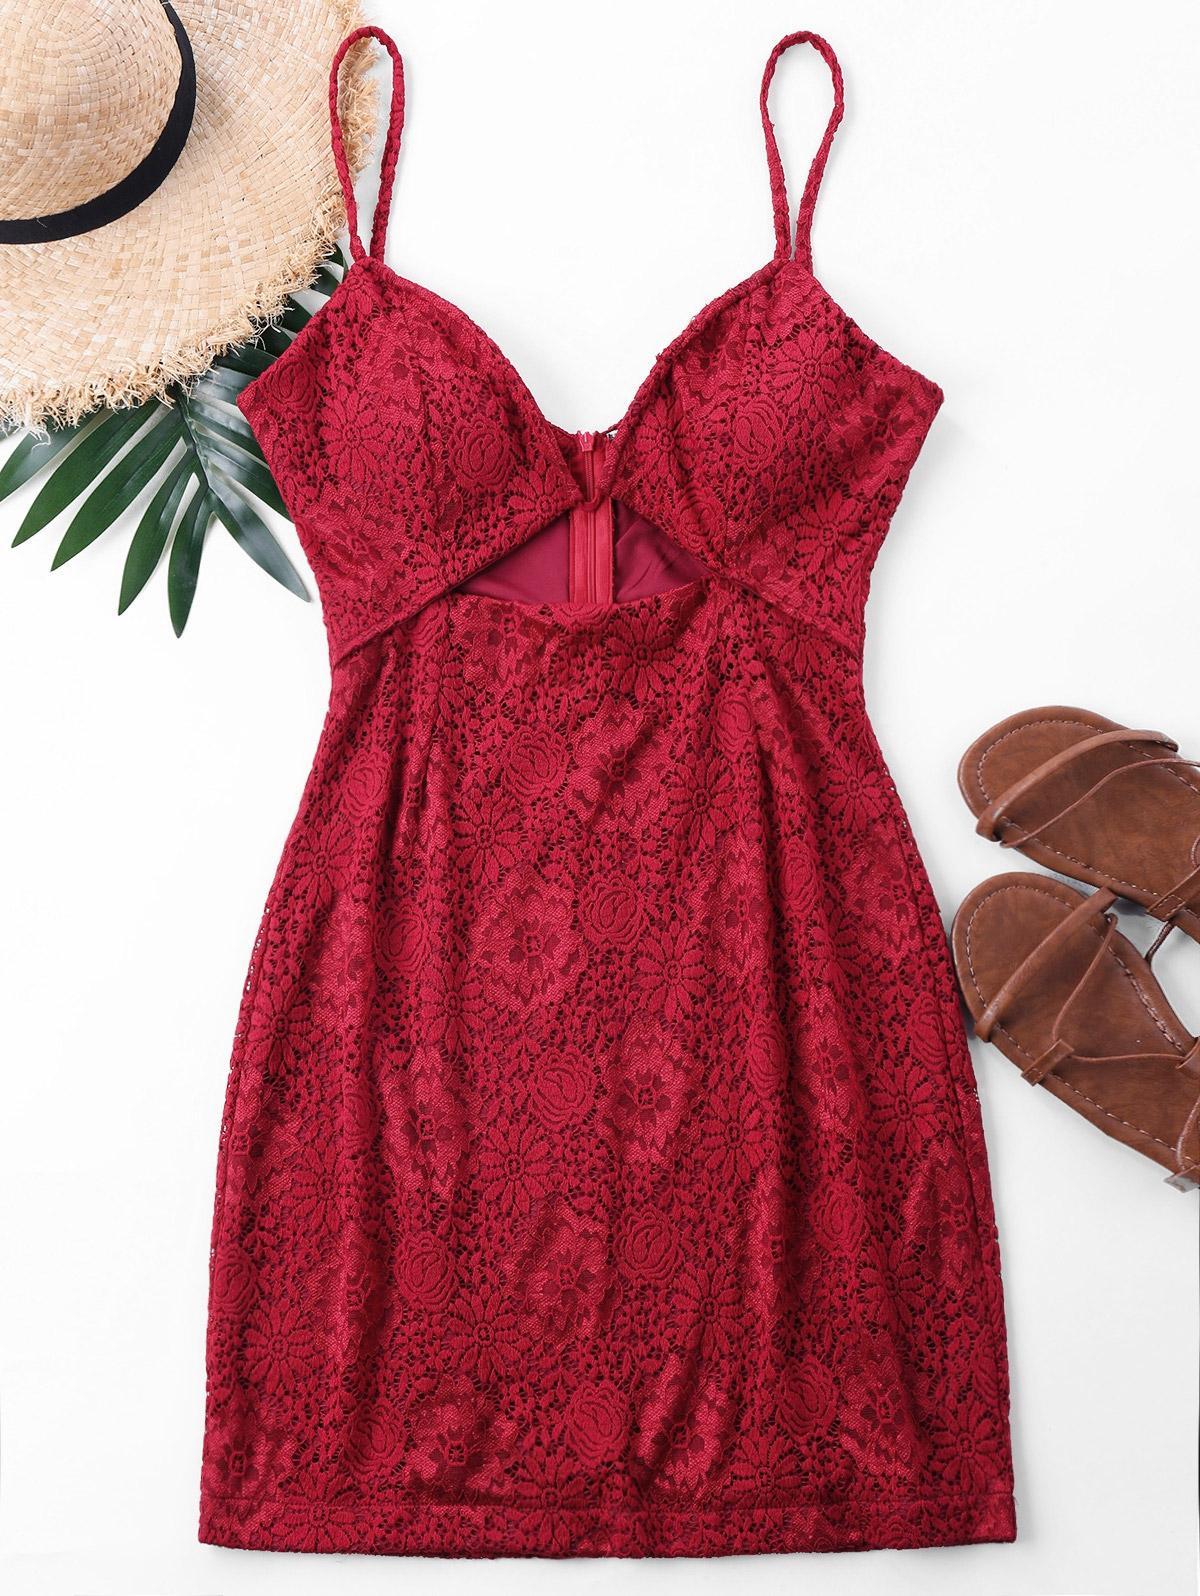 Mini Lace Spaghetti Strap Dress 252070302